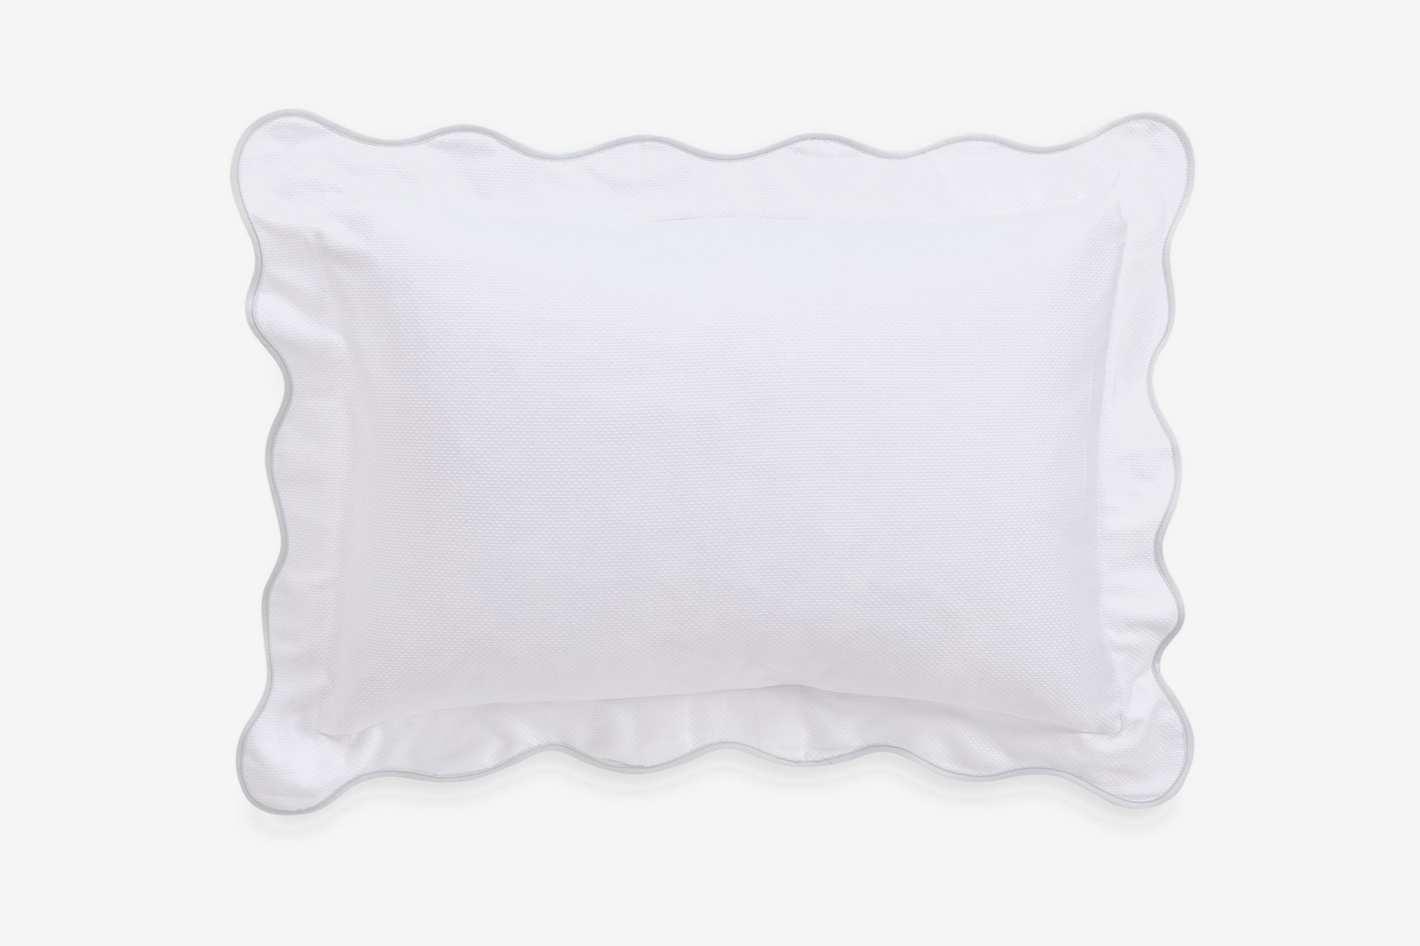 Barbara Barry Dream Peaceful Pique Fountain Oblong Throw Pillow in White